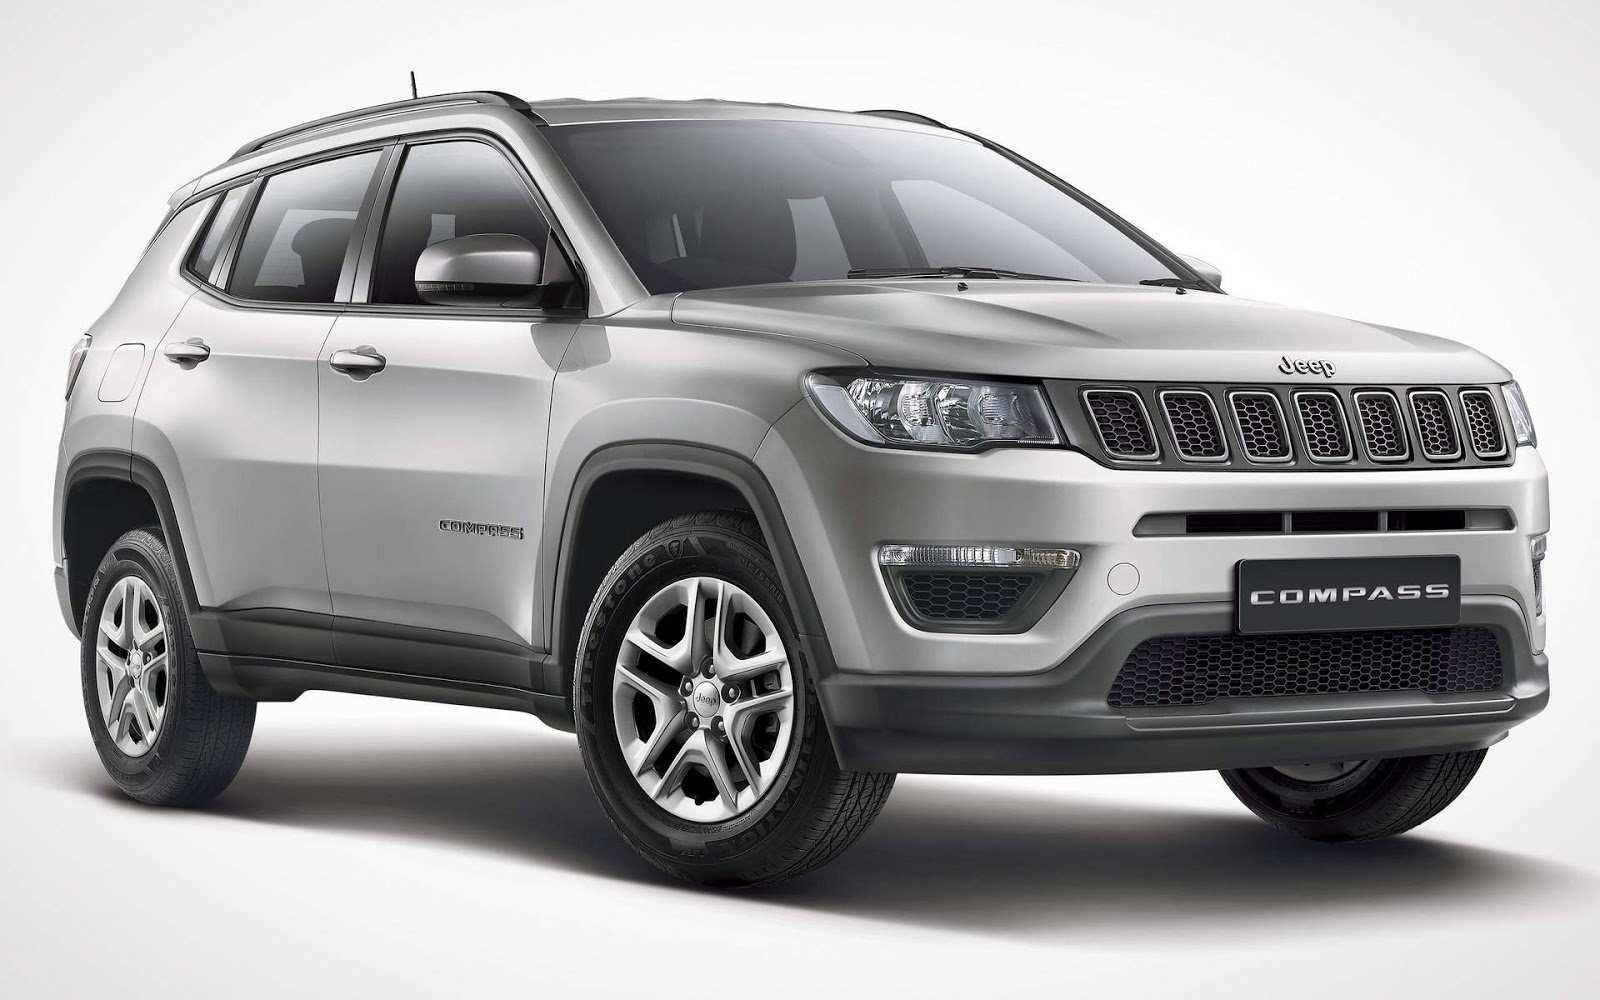 43 Best Review Jeep Compass 2020 Quando Chega Ratings for Jeep Compass 2020 Quando Chega